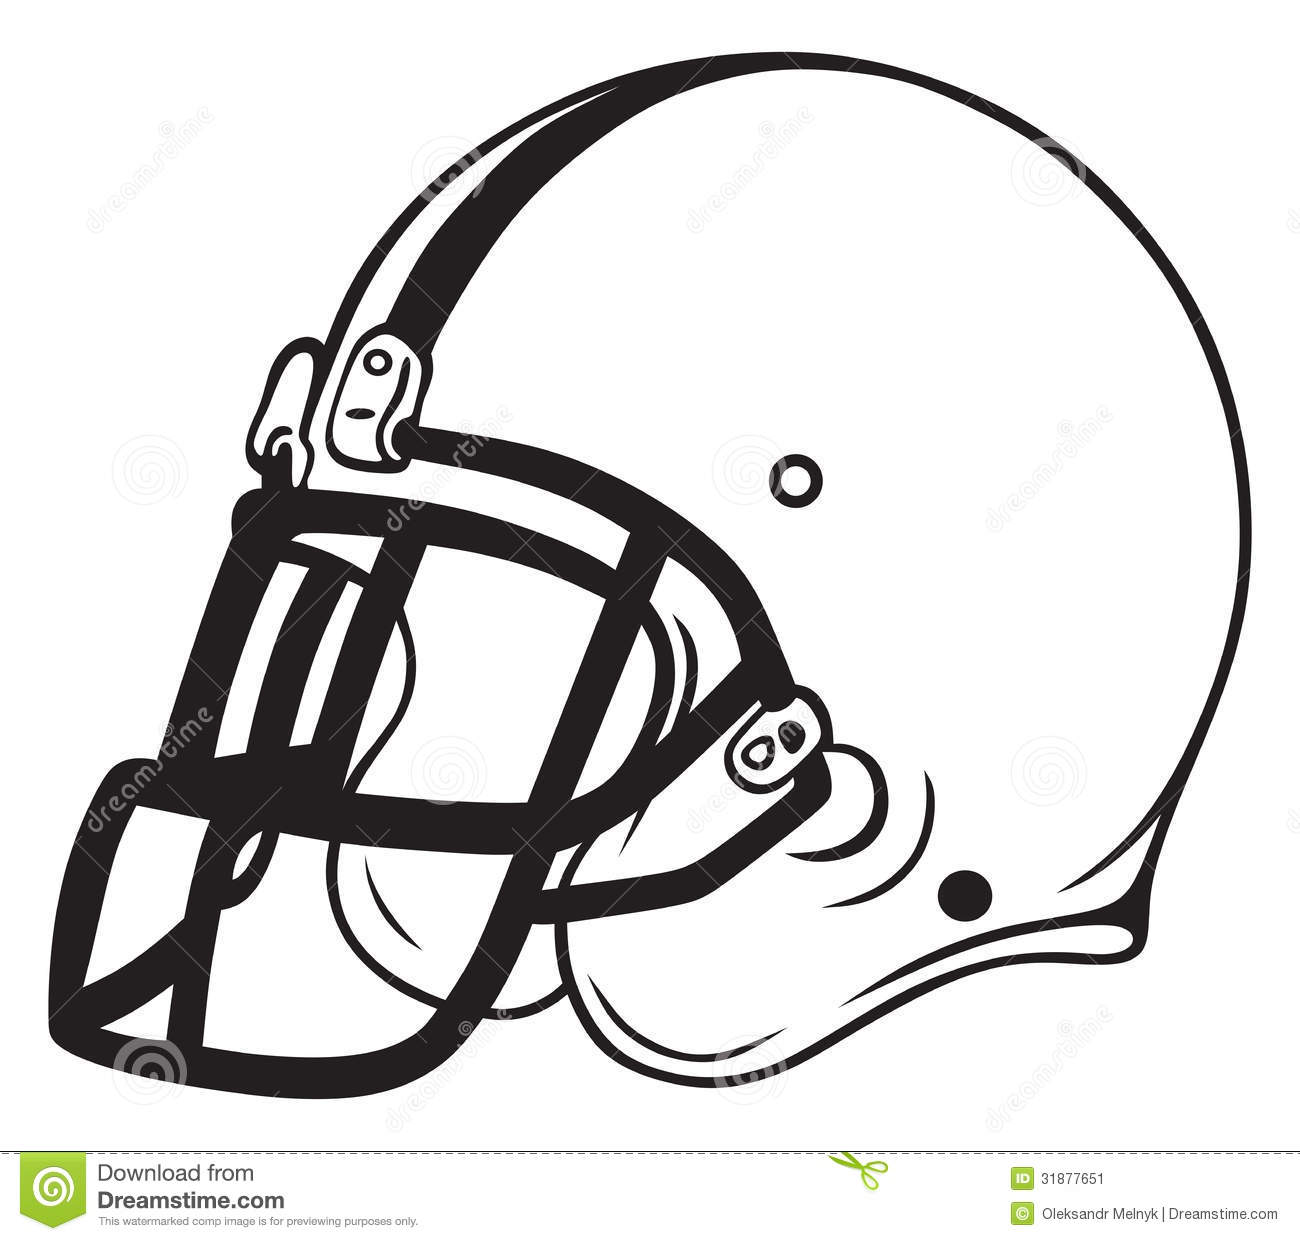 Black football helmet clipart .-Black football helmet clipart .-13